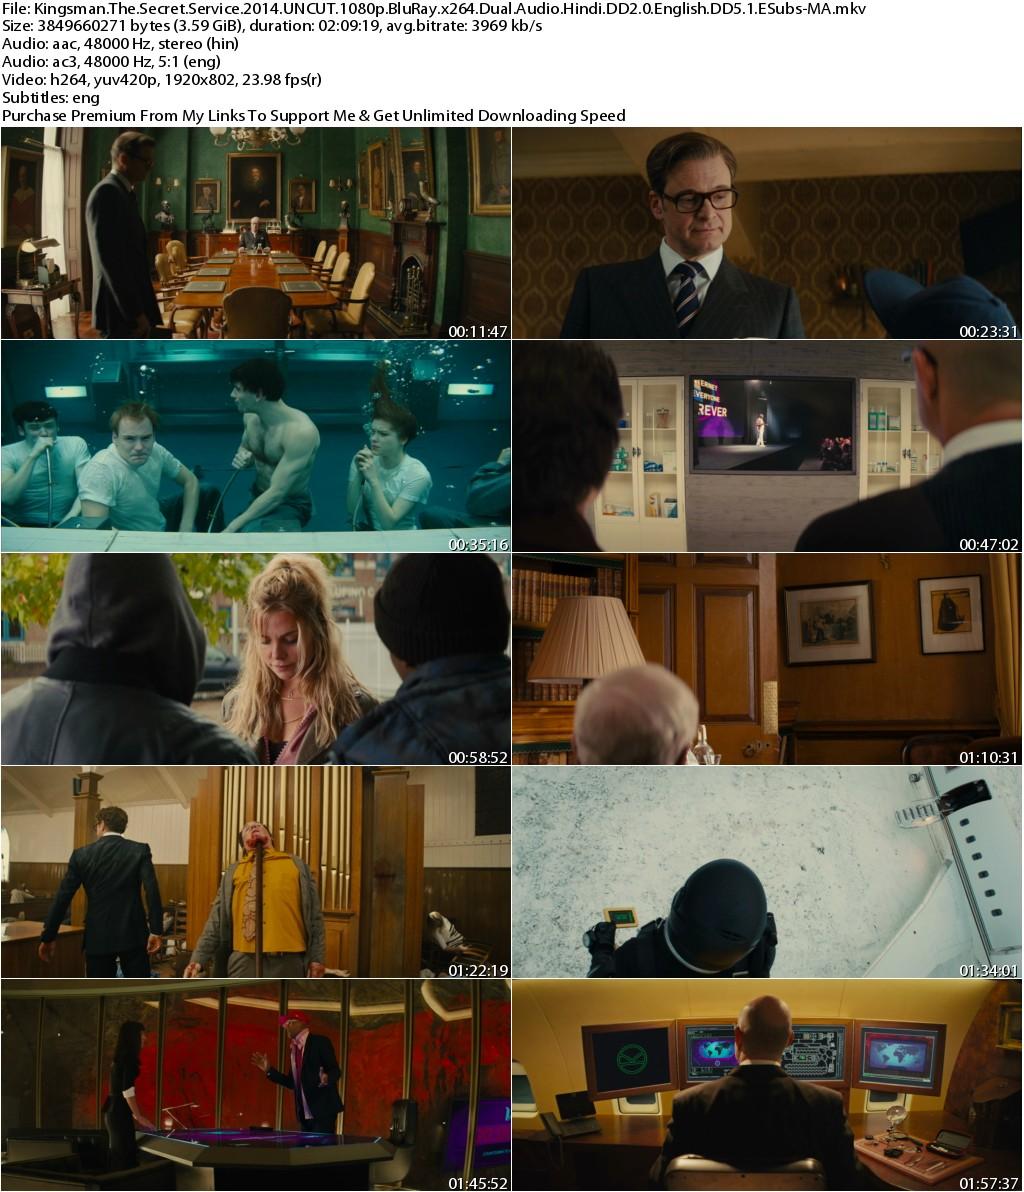 Kingsman The Secret Service (2014) UNCUT 1080p BluRay x264 Dual Audio Hindi DD2.0 English DD5.1 ESubs-MA